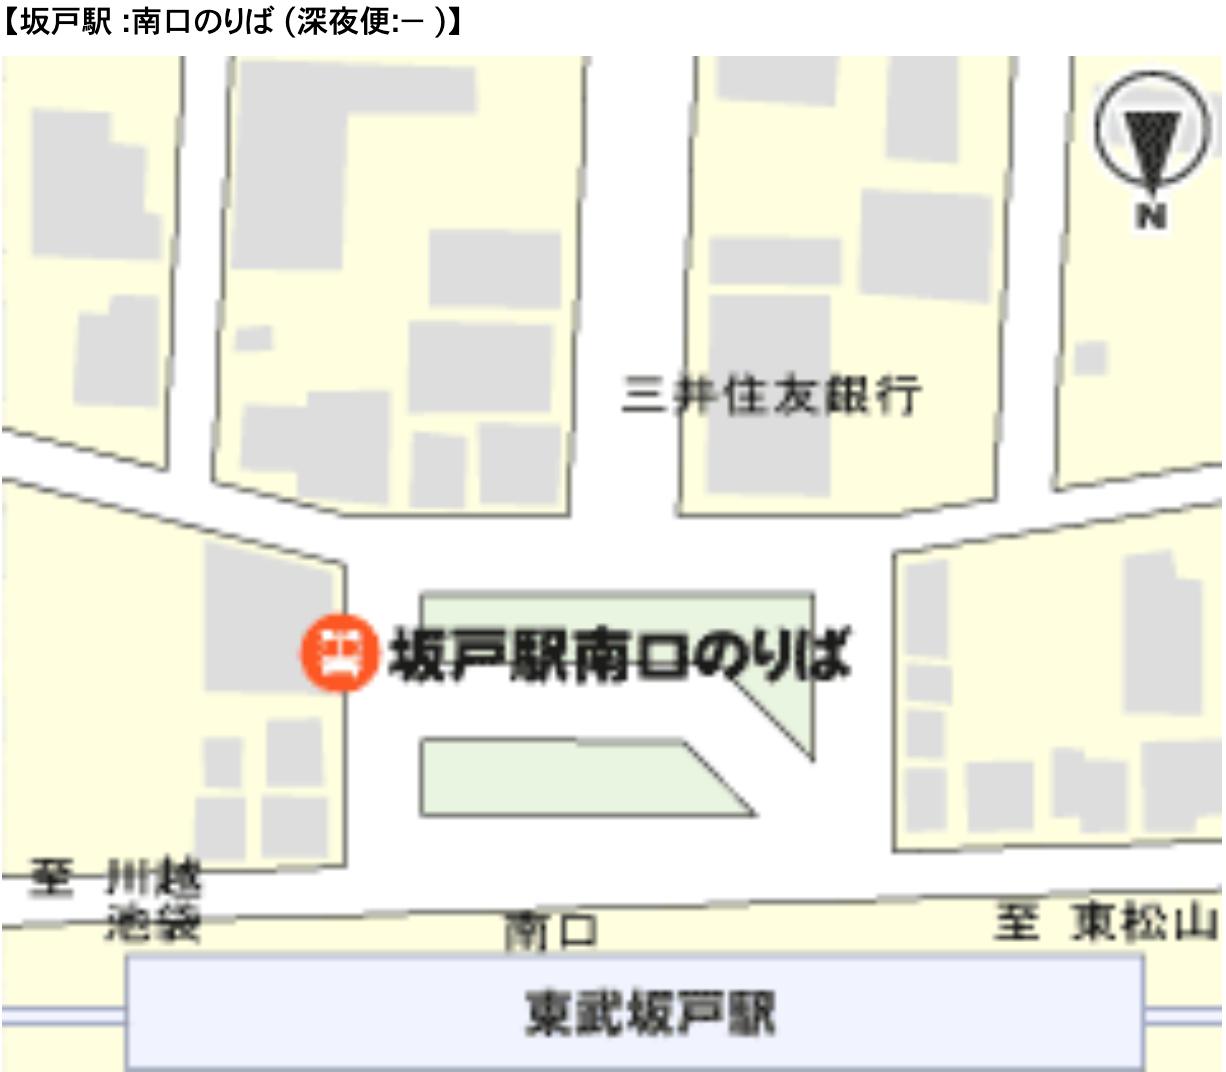 空港バス 坂戸駅 案内図